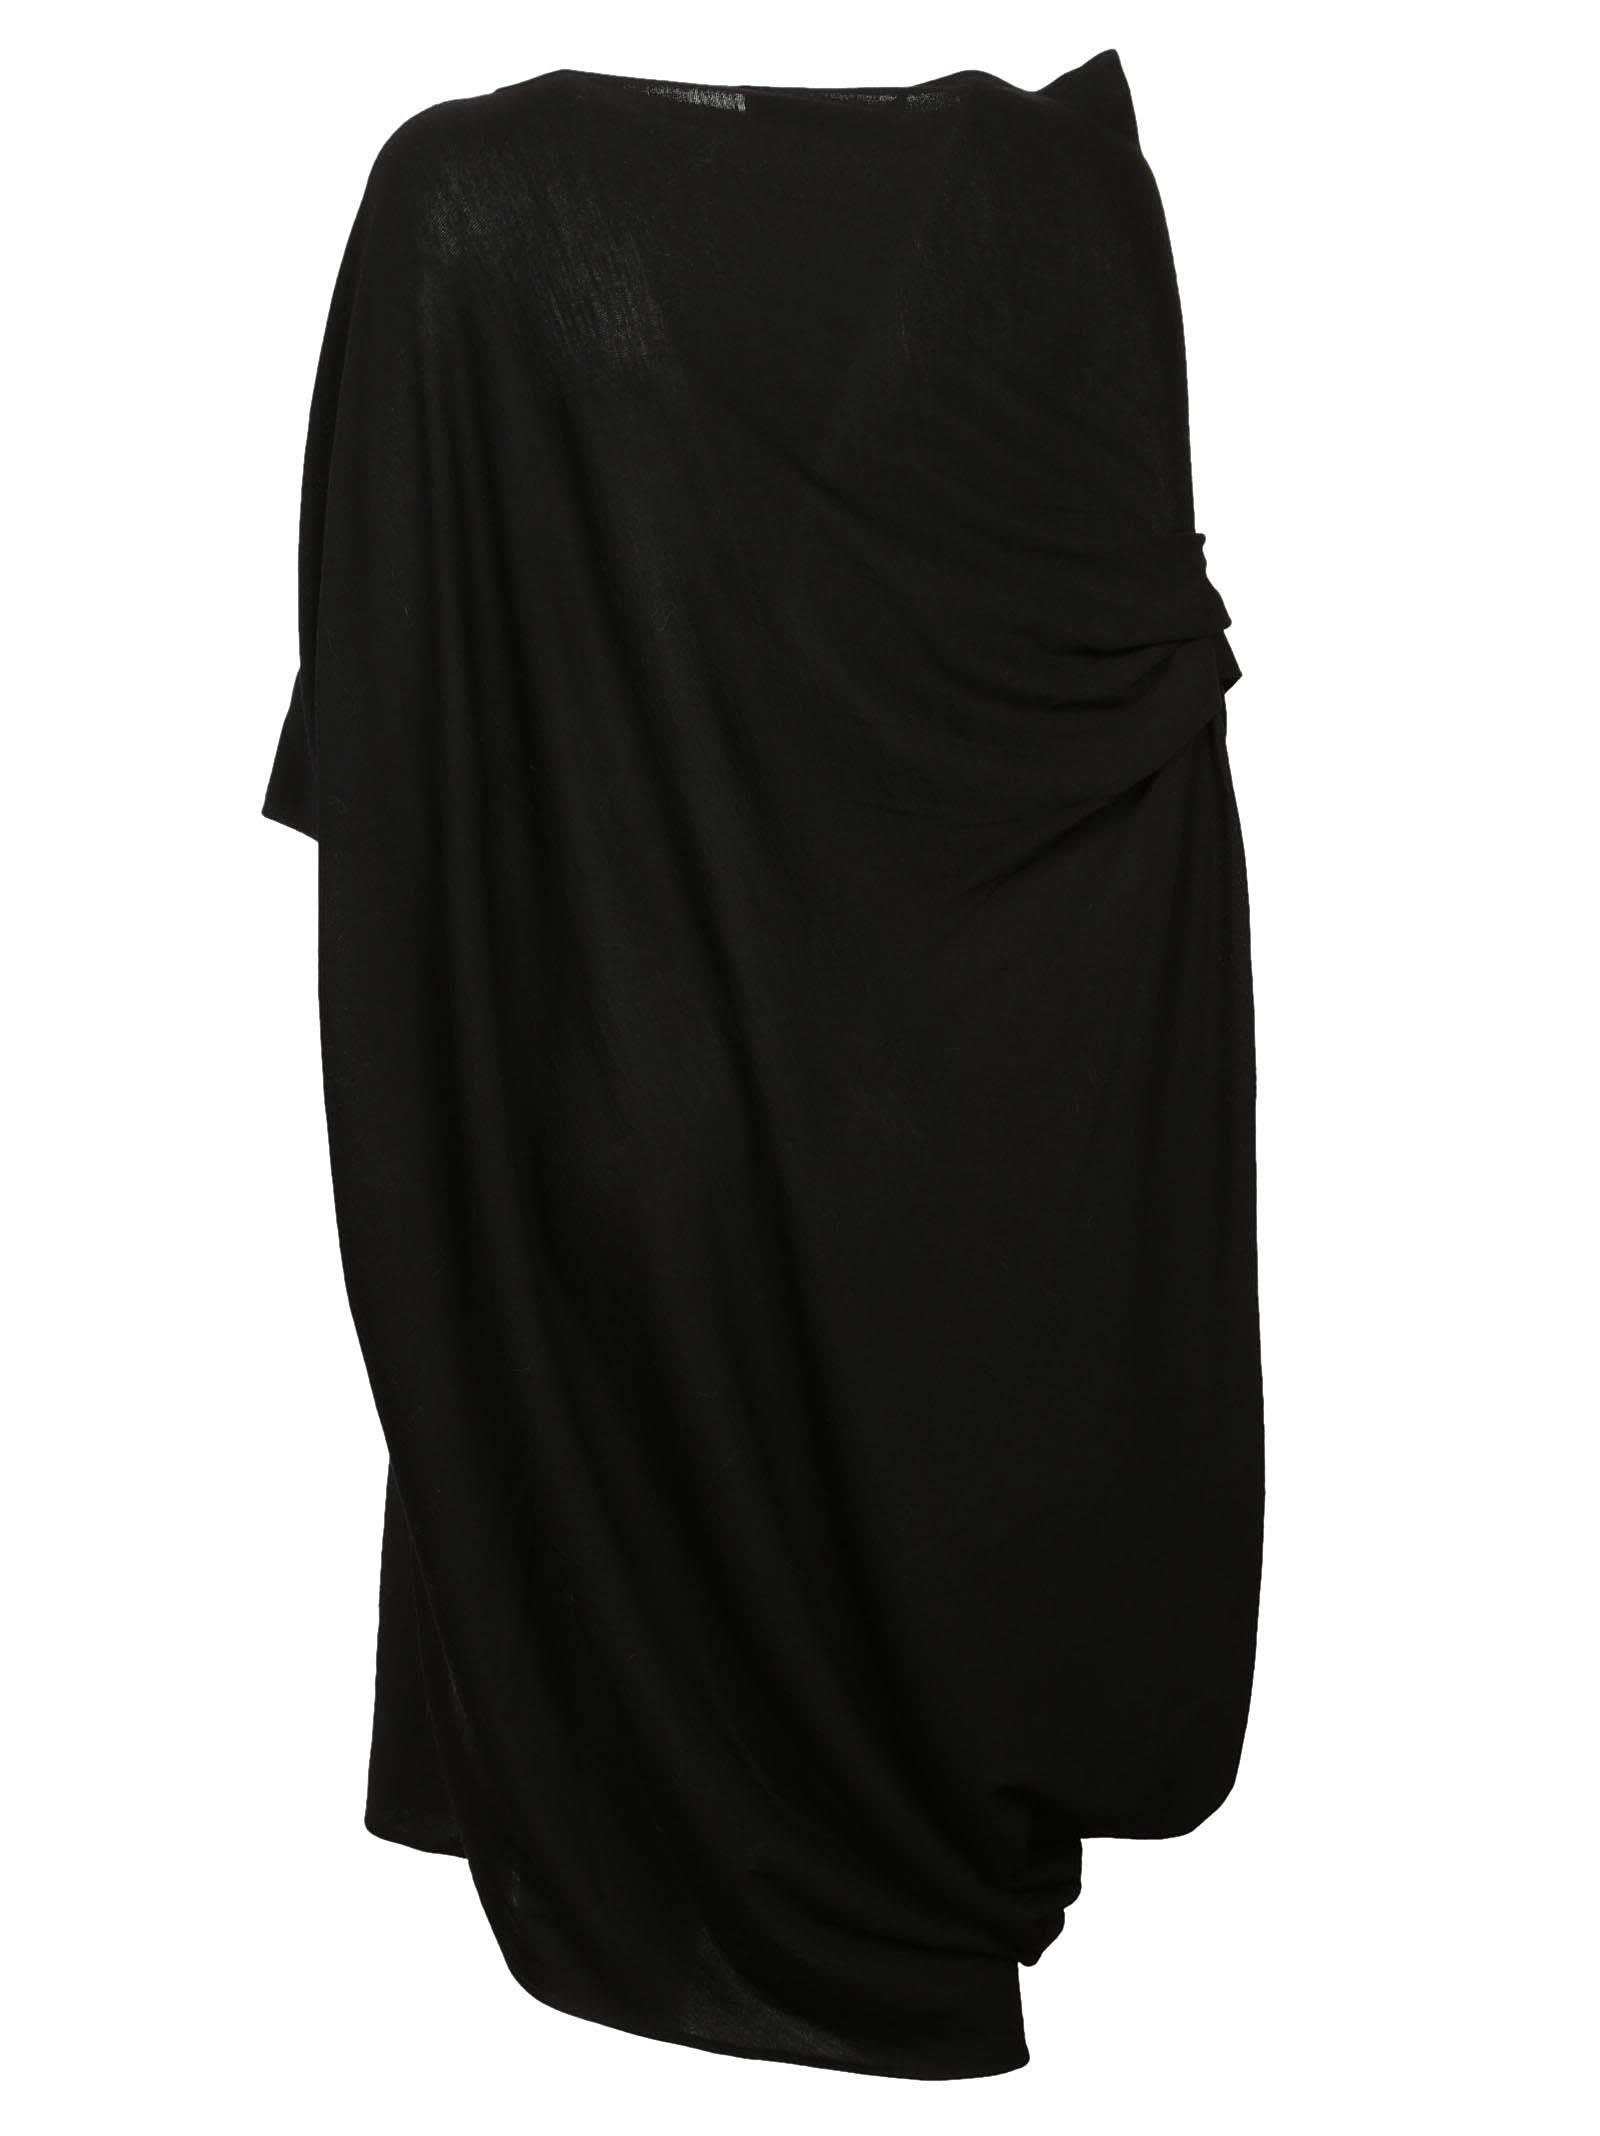 Gianluca Capannolo - Gianluca Capannolo Oversized Sweater Dress ...